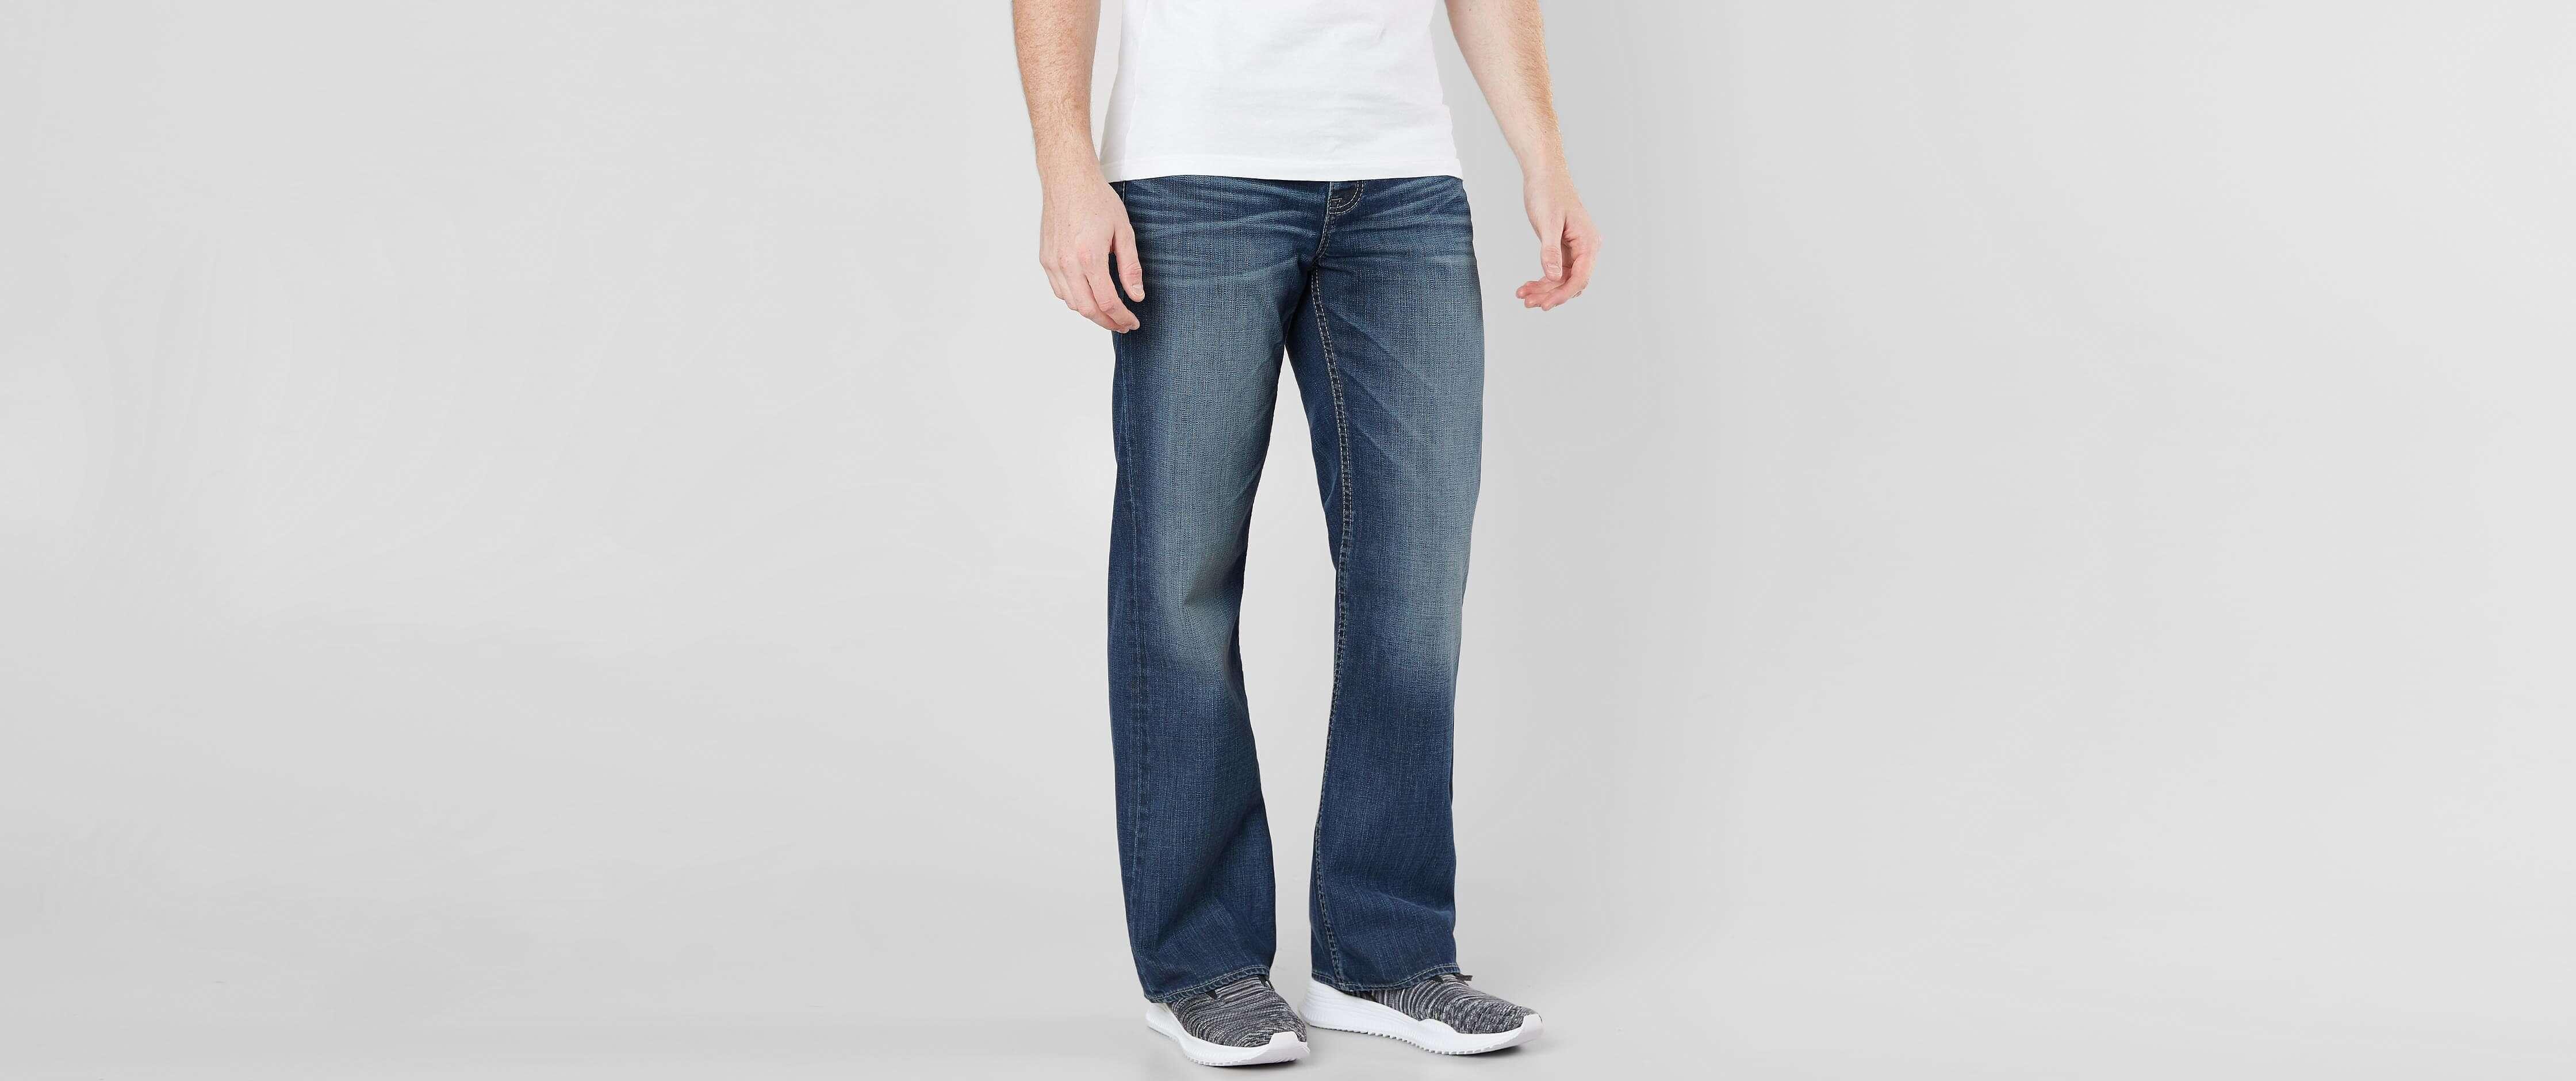 Black bbw in tight jeans triple bend